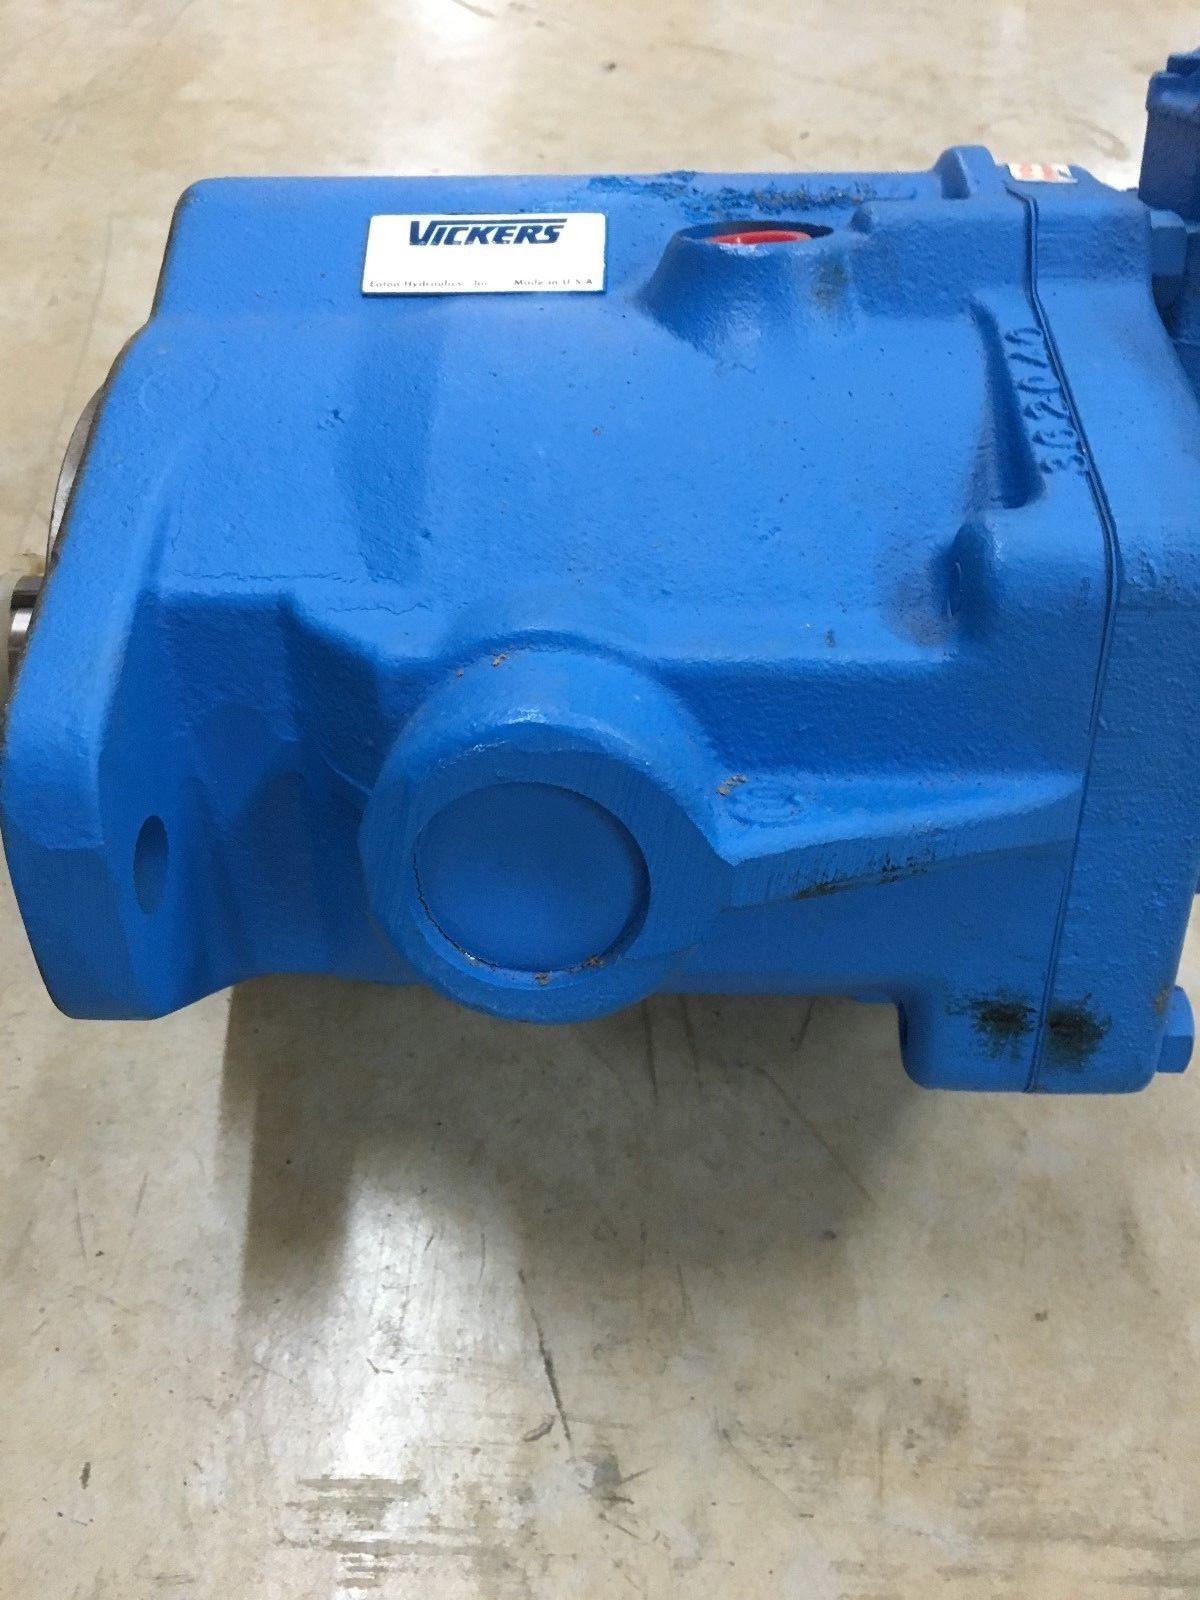 New No Box Vickers 380015 Hydraulic Axial and 50 similar items